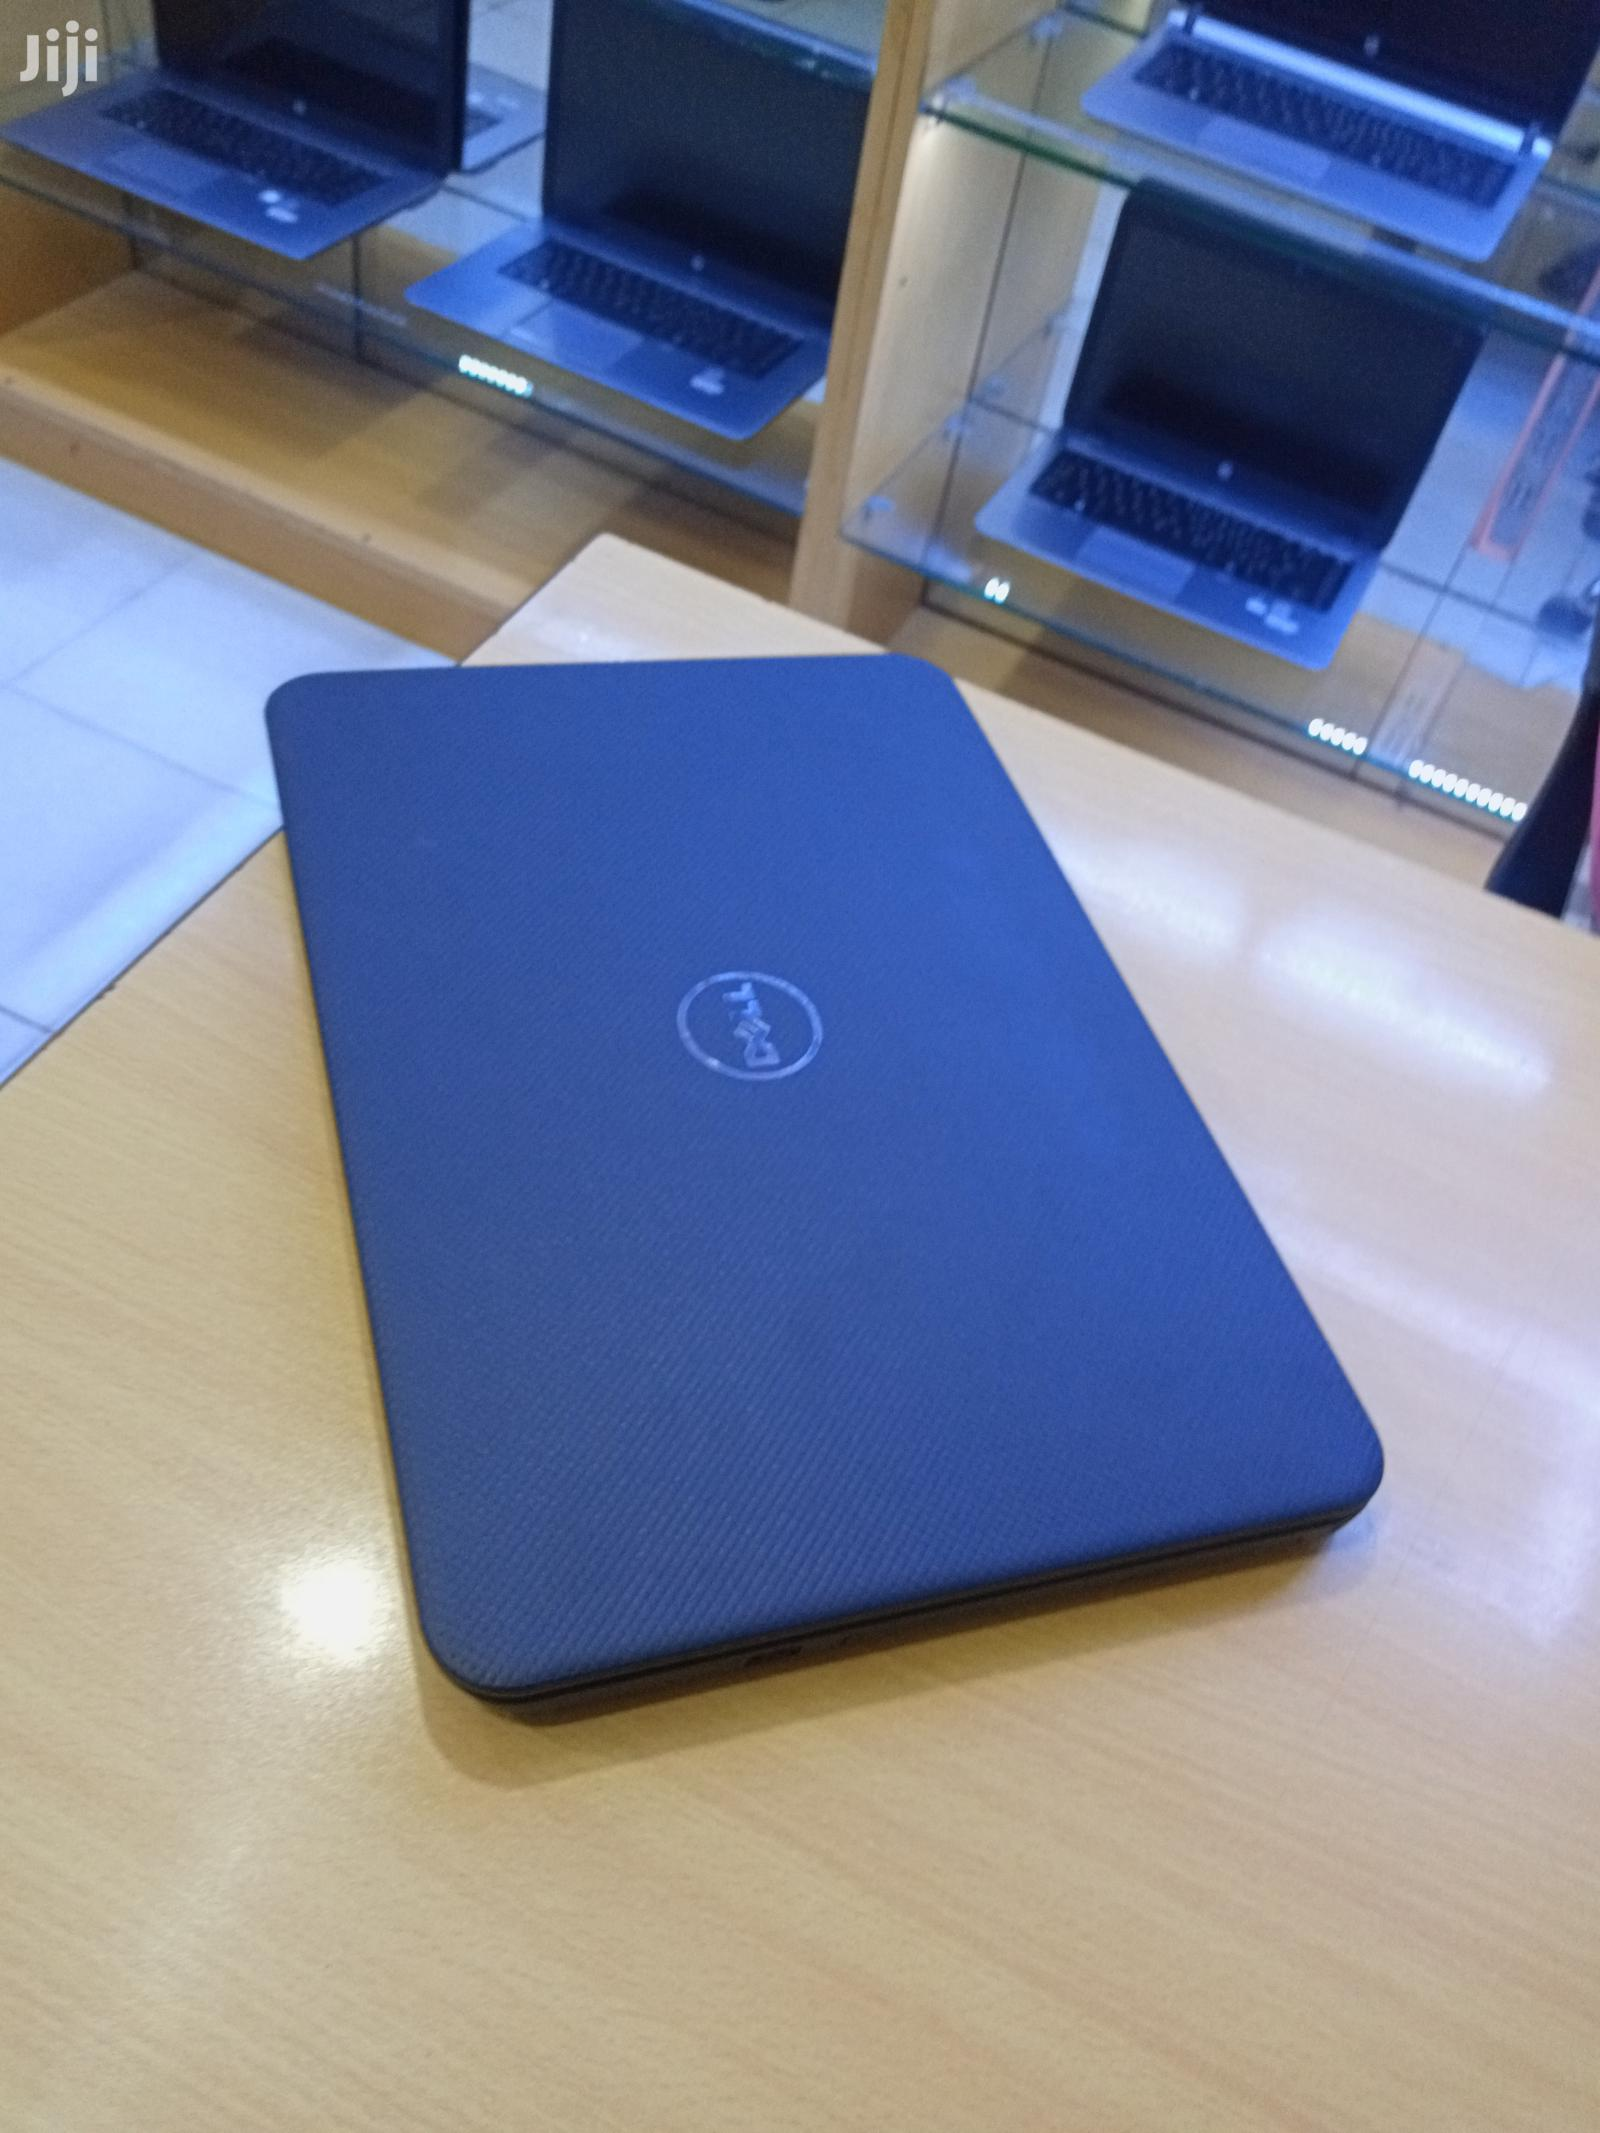 Dell Inspiron 15 15.6 Inches 500 Gb Hdd Core I5 4 Gb Ram